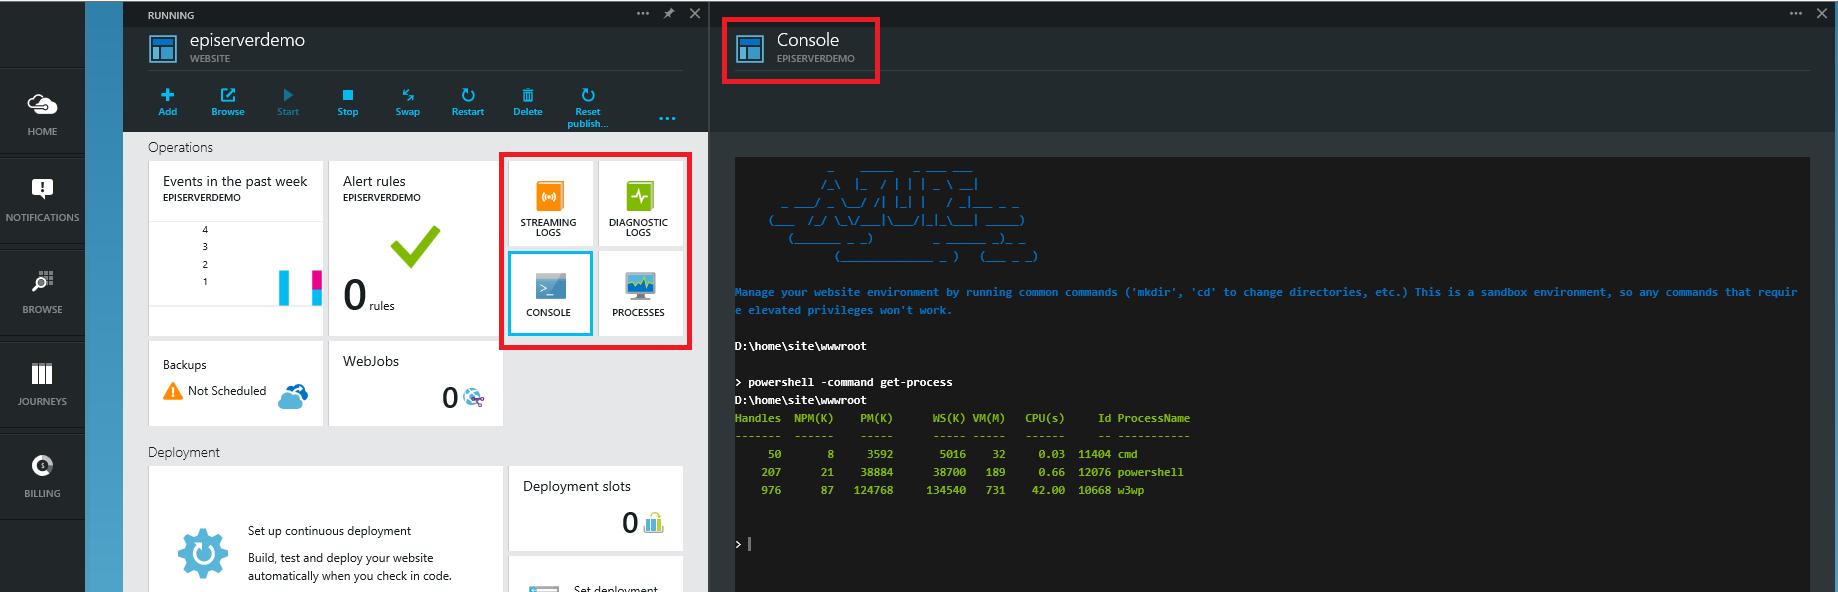 Azure portal Operation Console